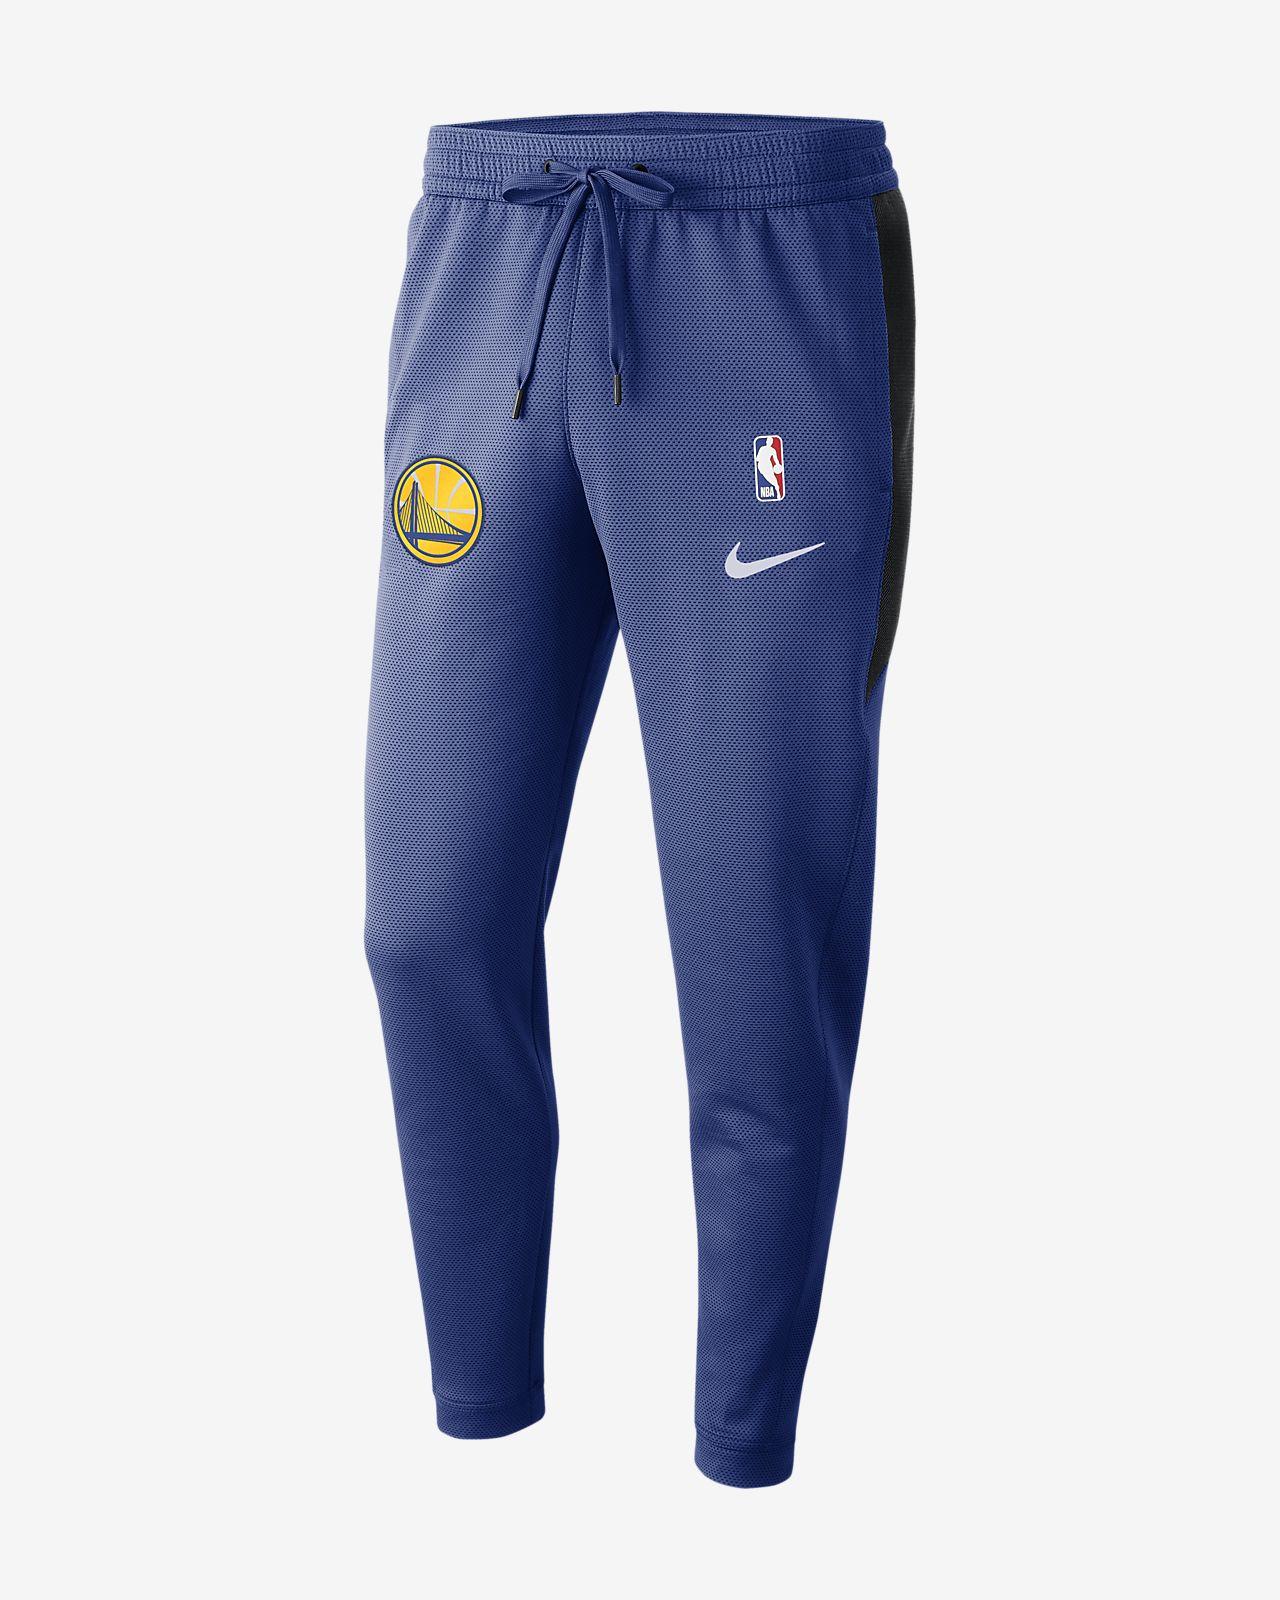 Golden State Warriors Nike Therma Flex Showtime Pantalons de l'NBA - Home